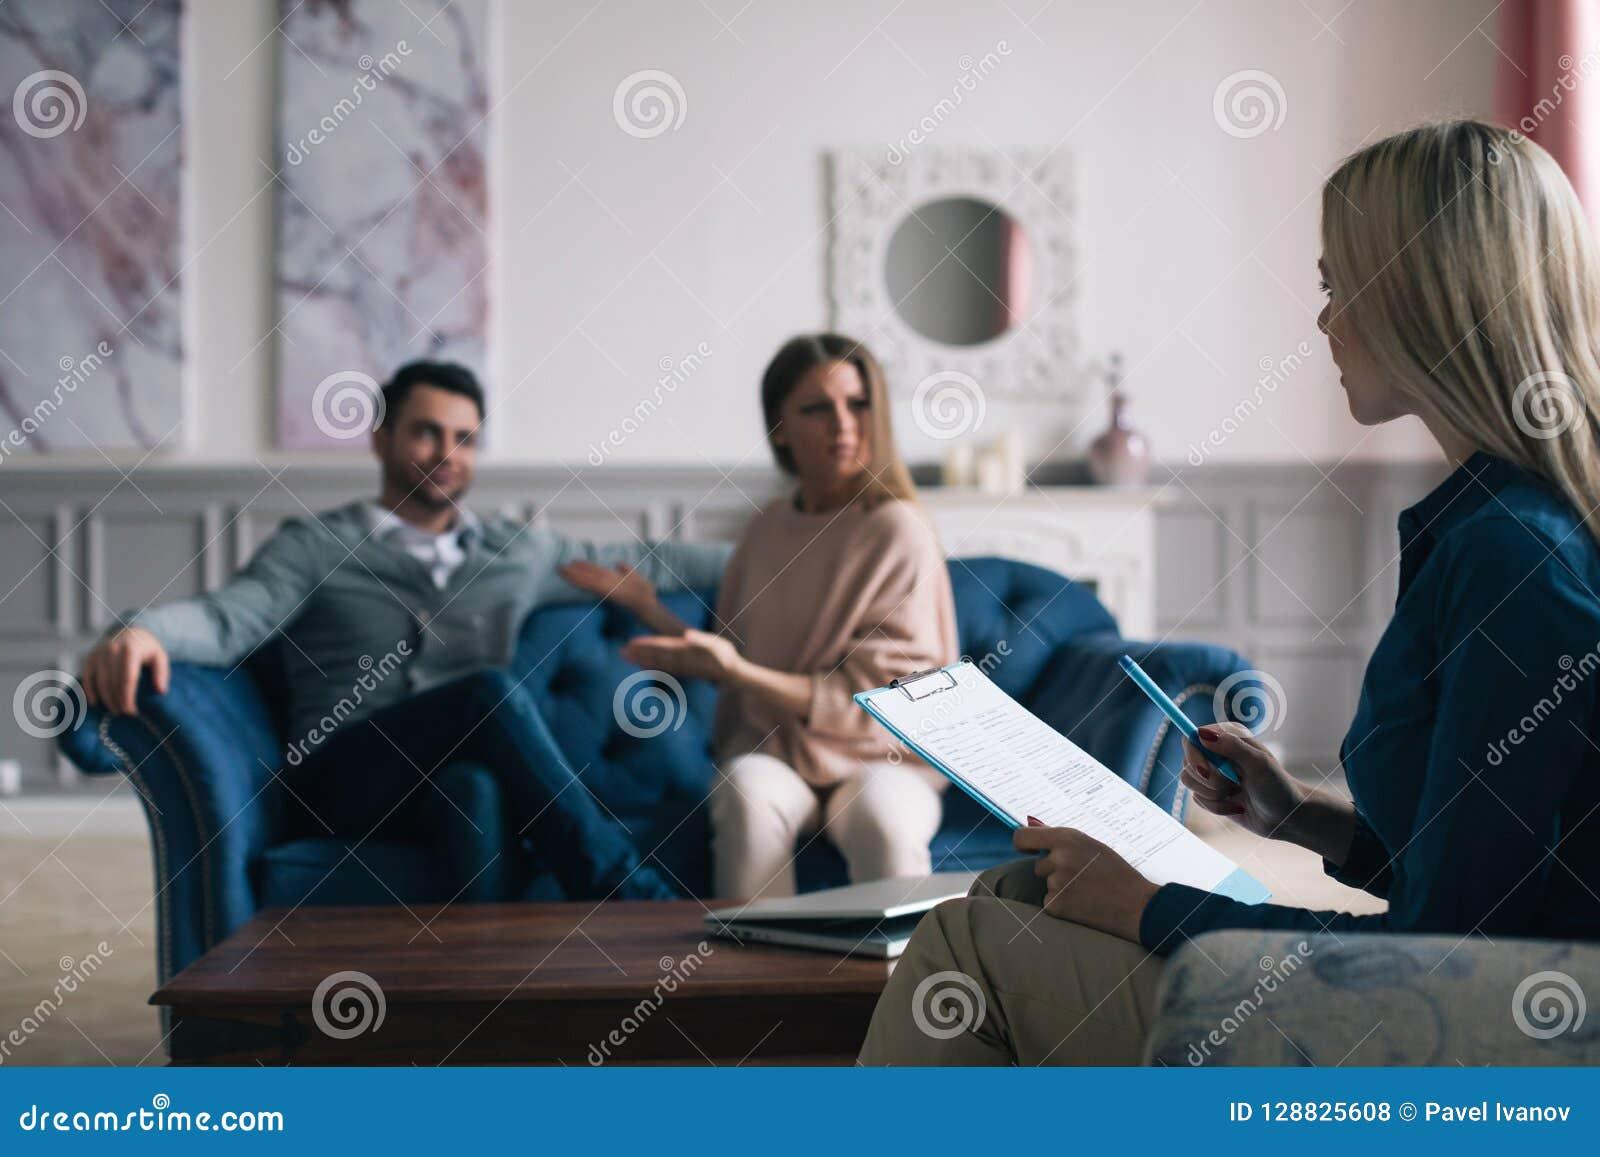 Psicólogo profissional que conduz uma consulta